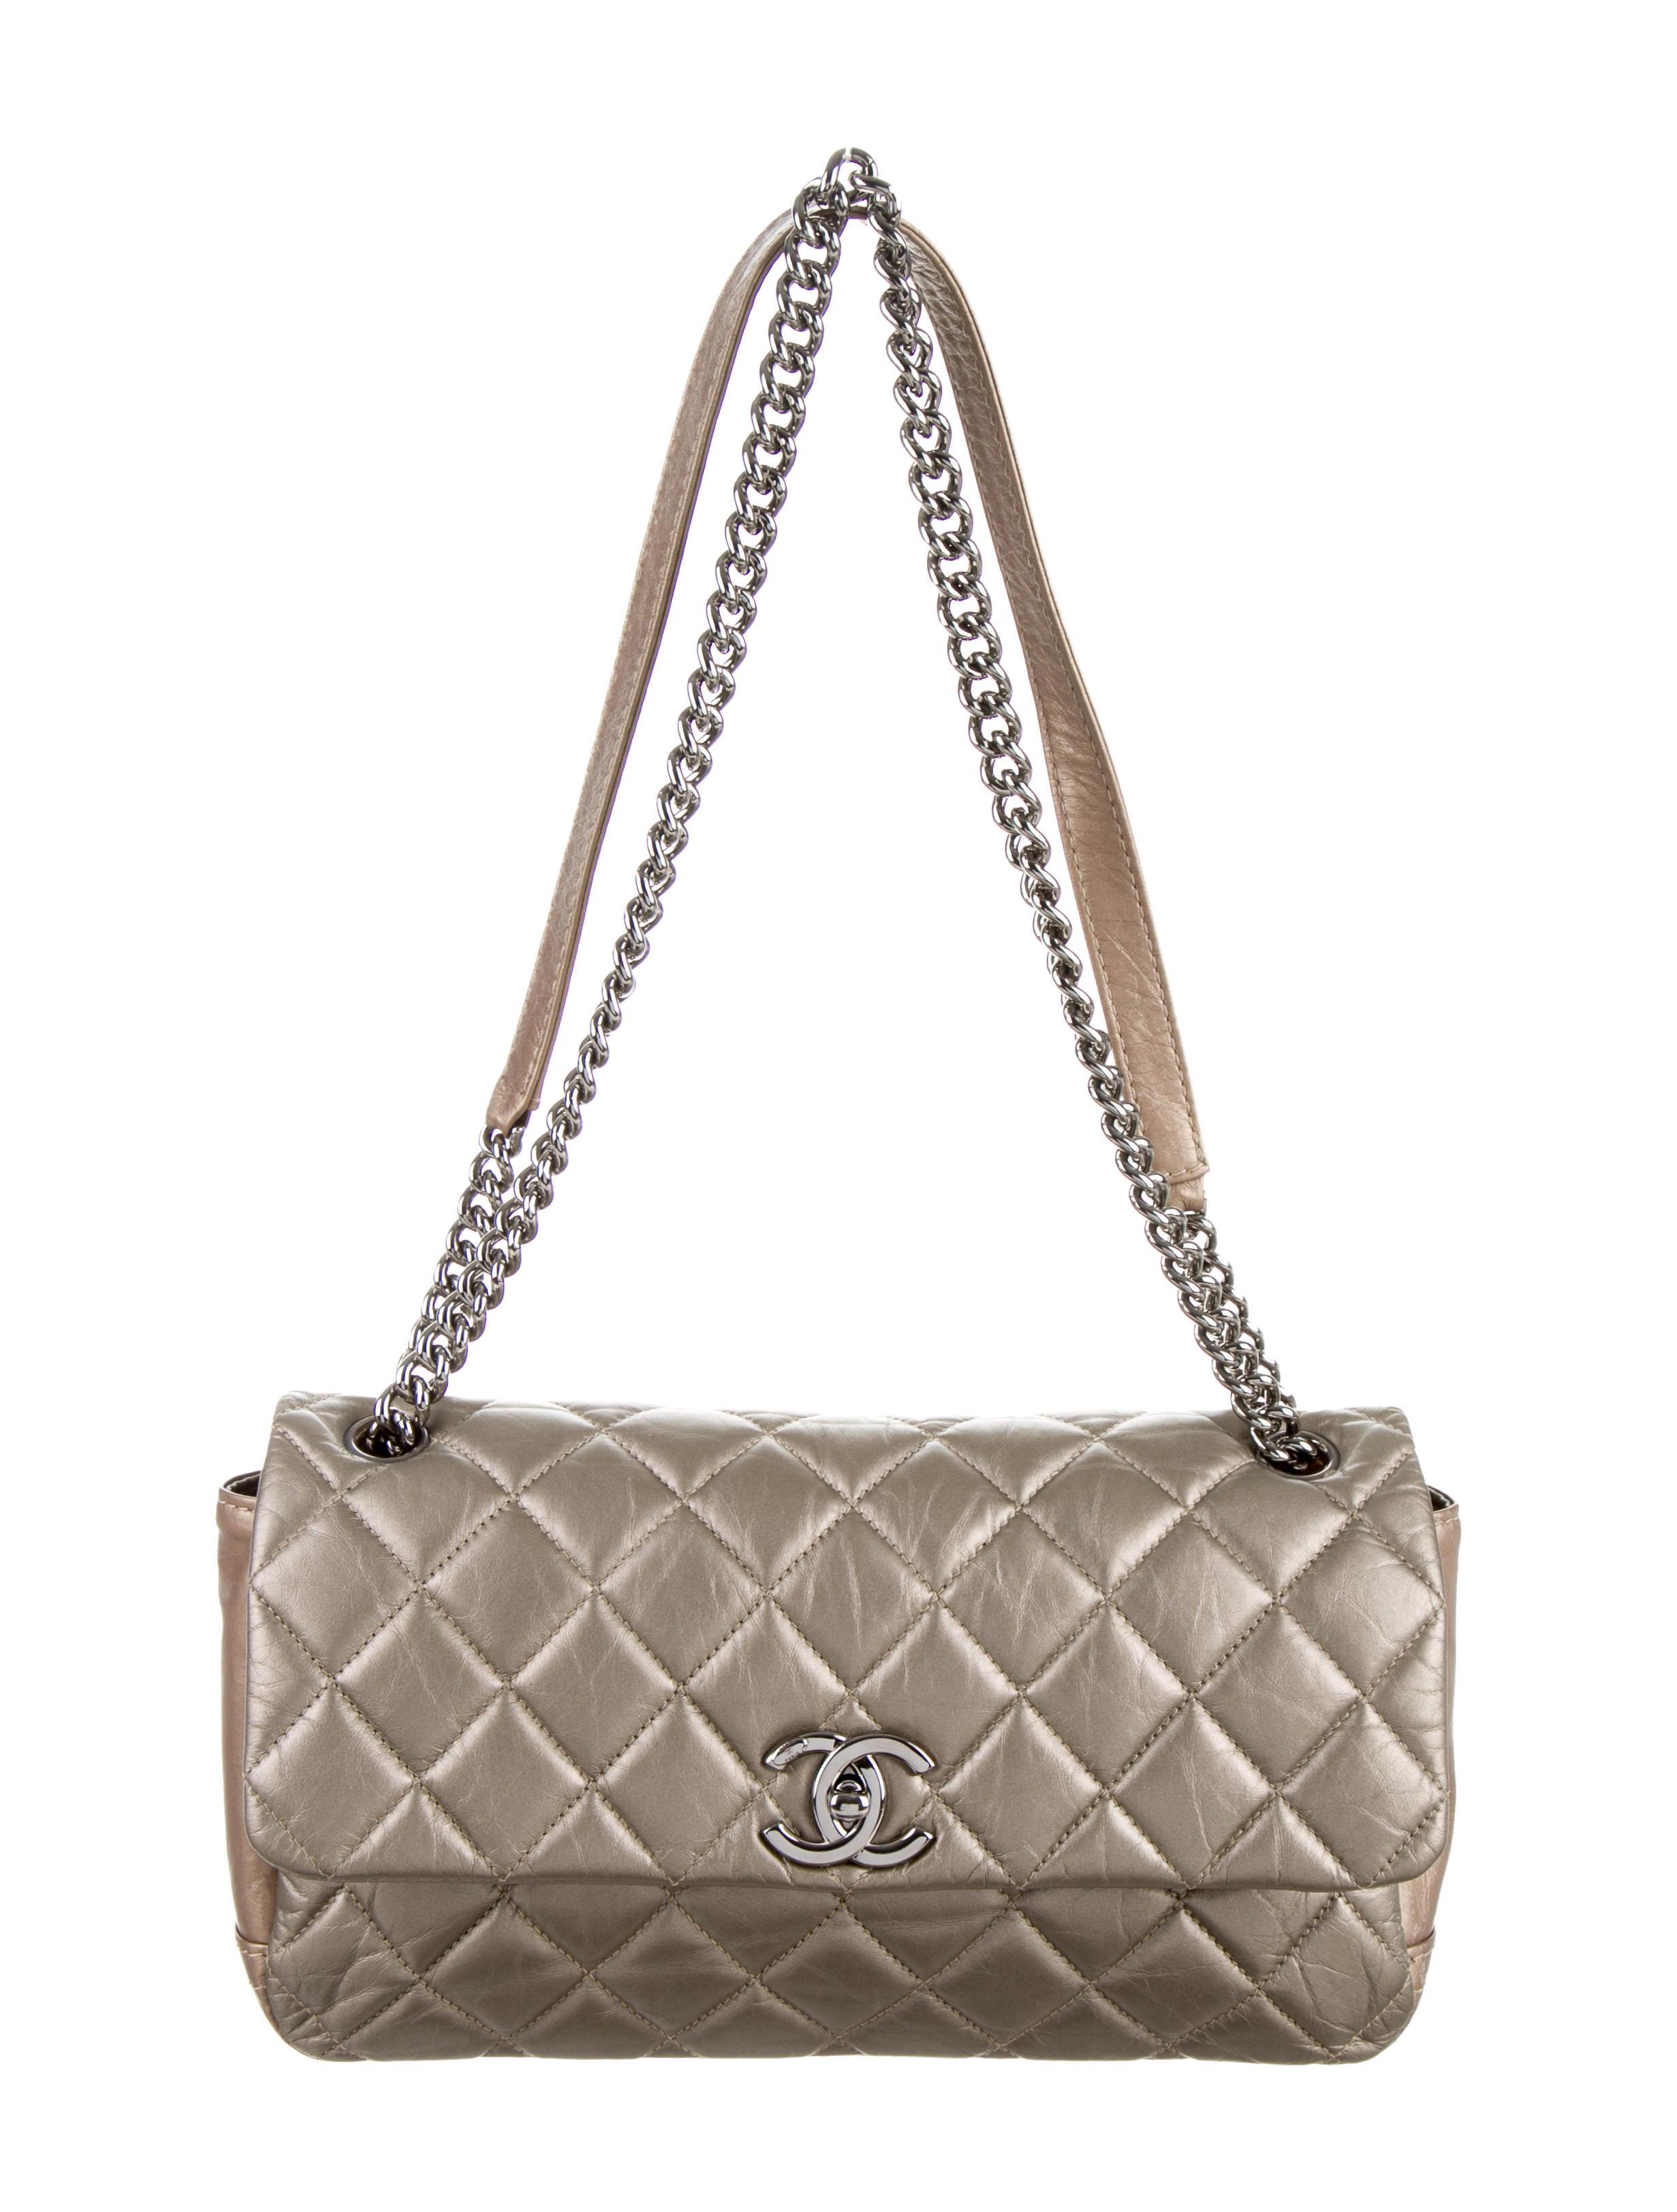 8a56662280fa Chanel Small Lady Pearly Flap Bag - Handbags - CHA93608 | The RealReal